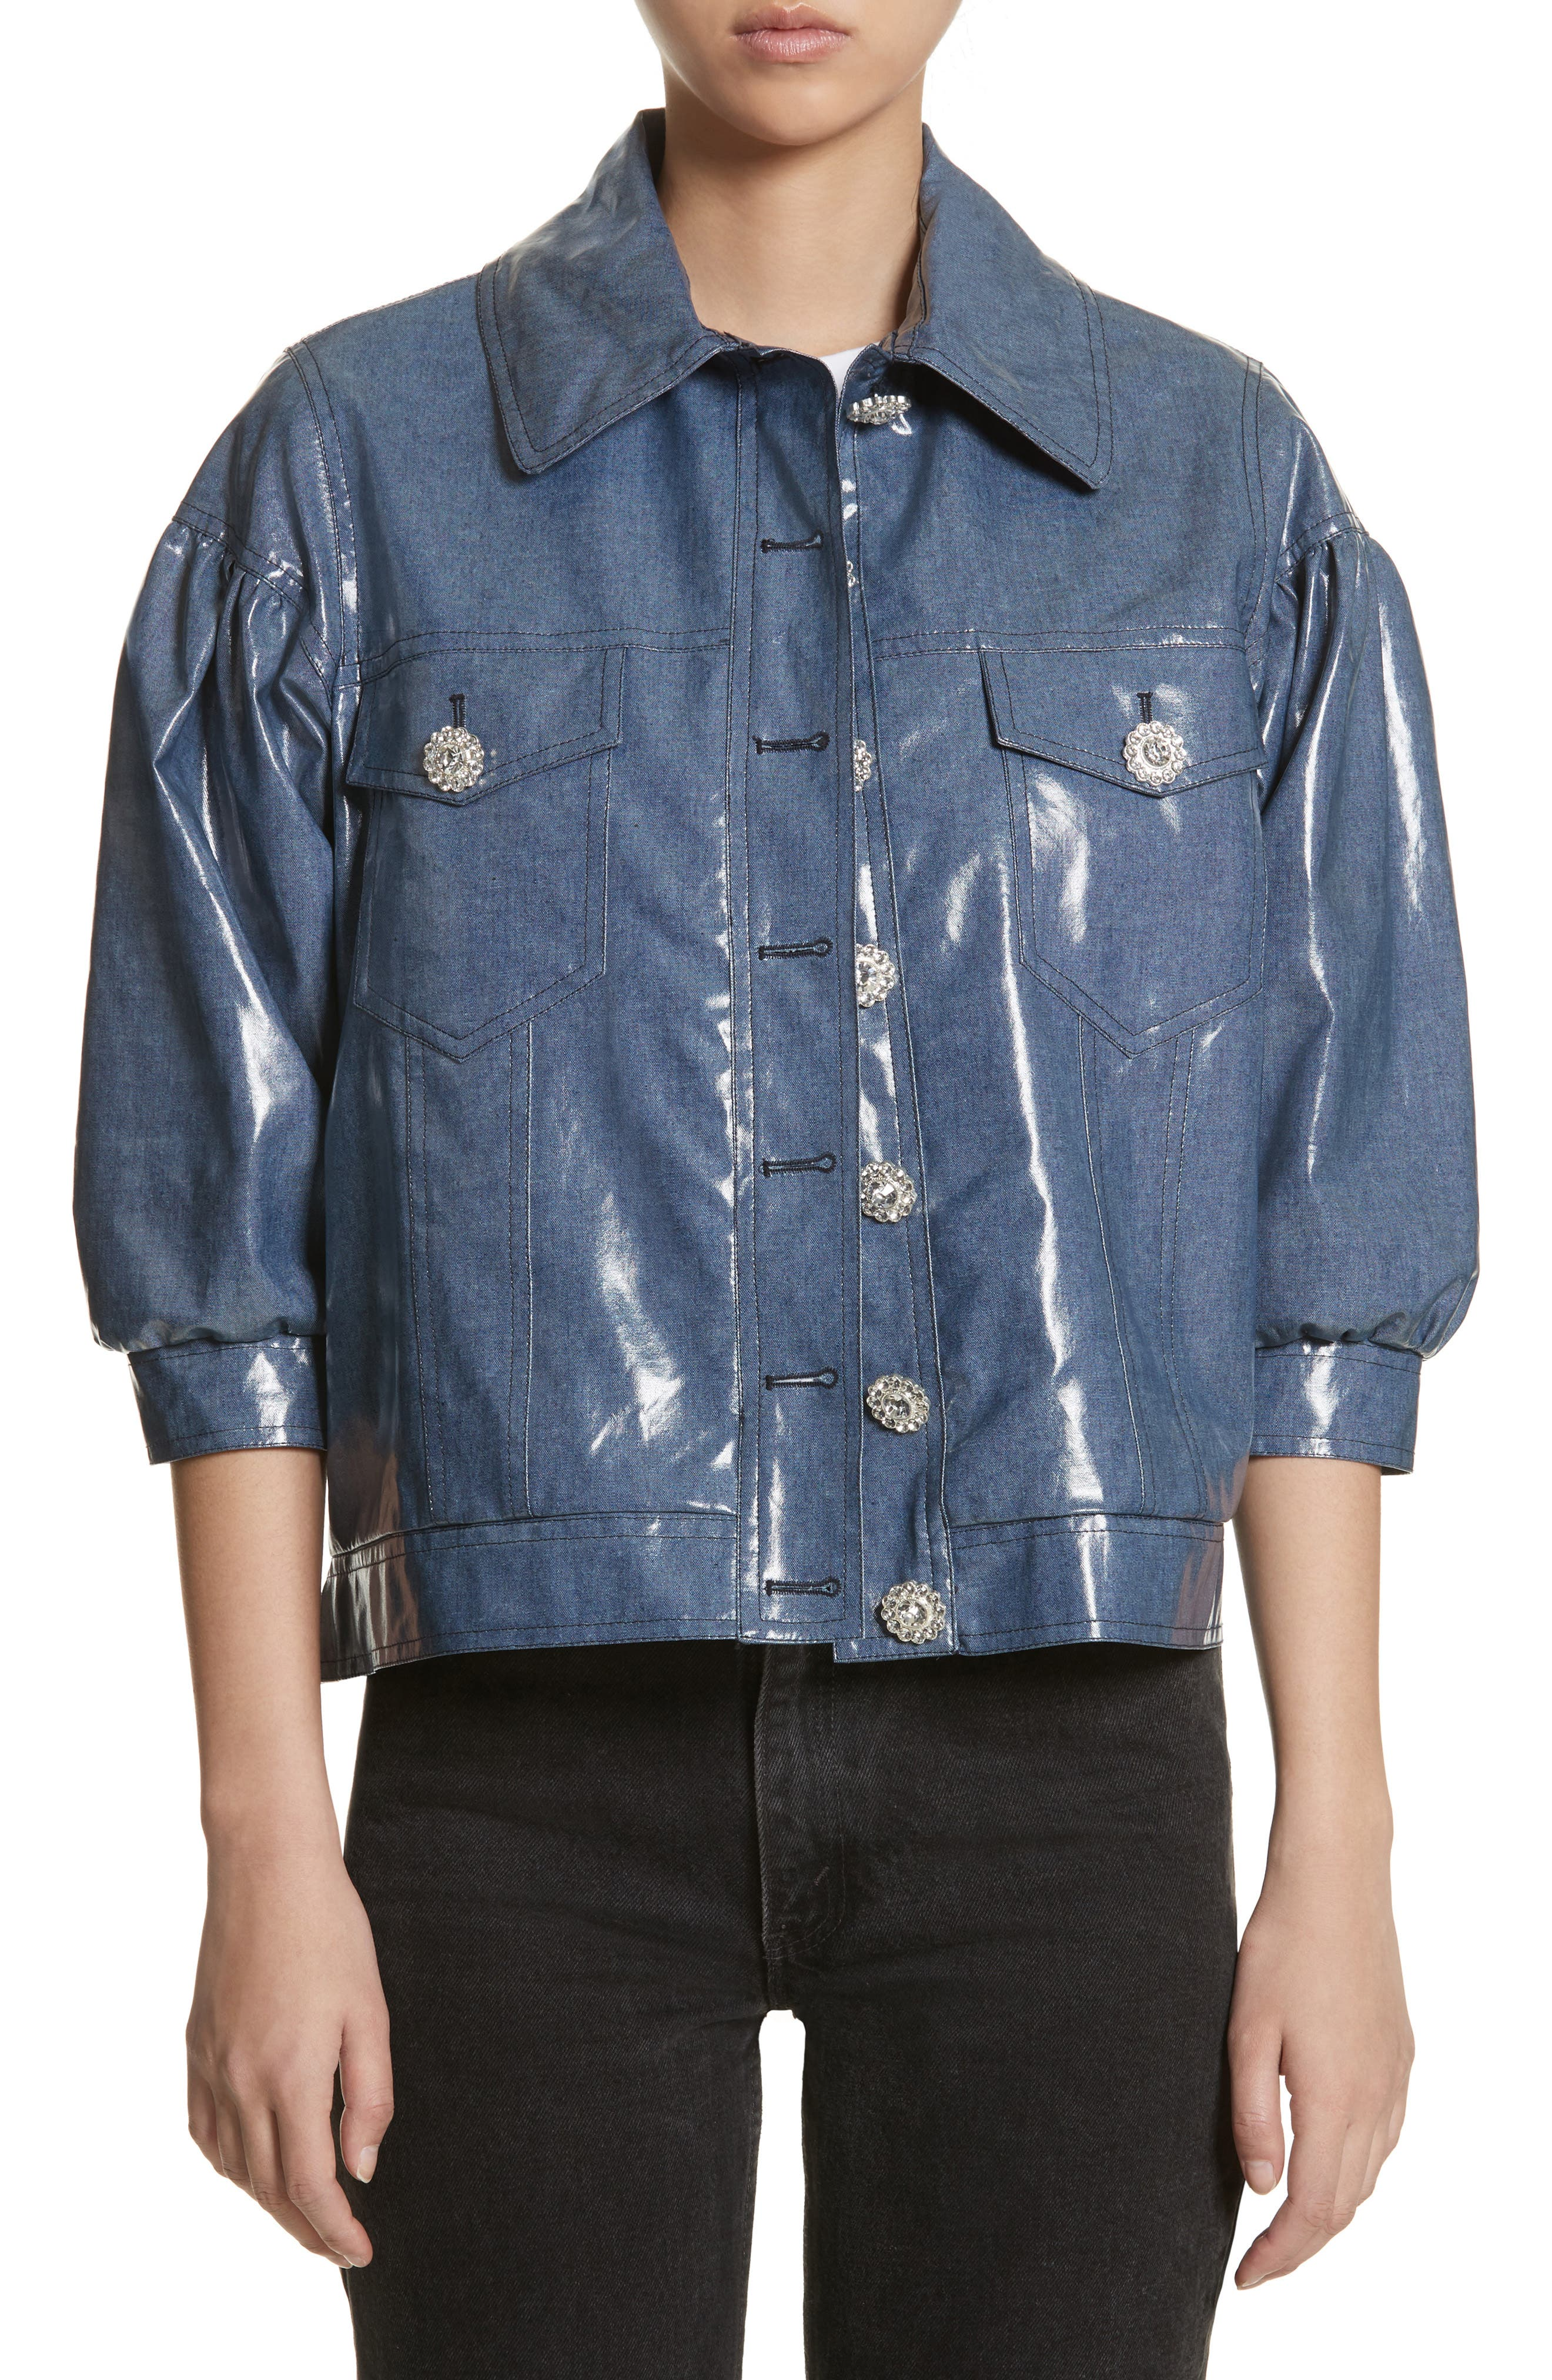 Luca Puff Sleeve Denim Jacket,                         Main,                         color, Navy